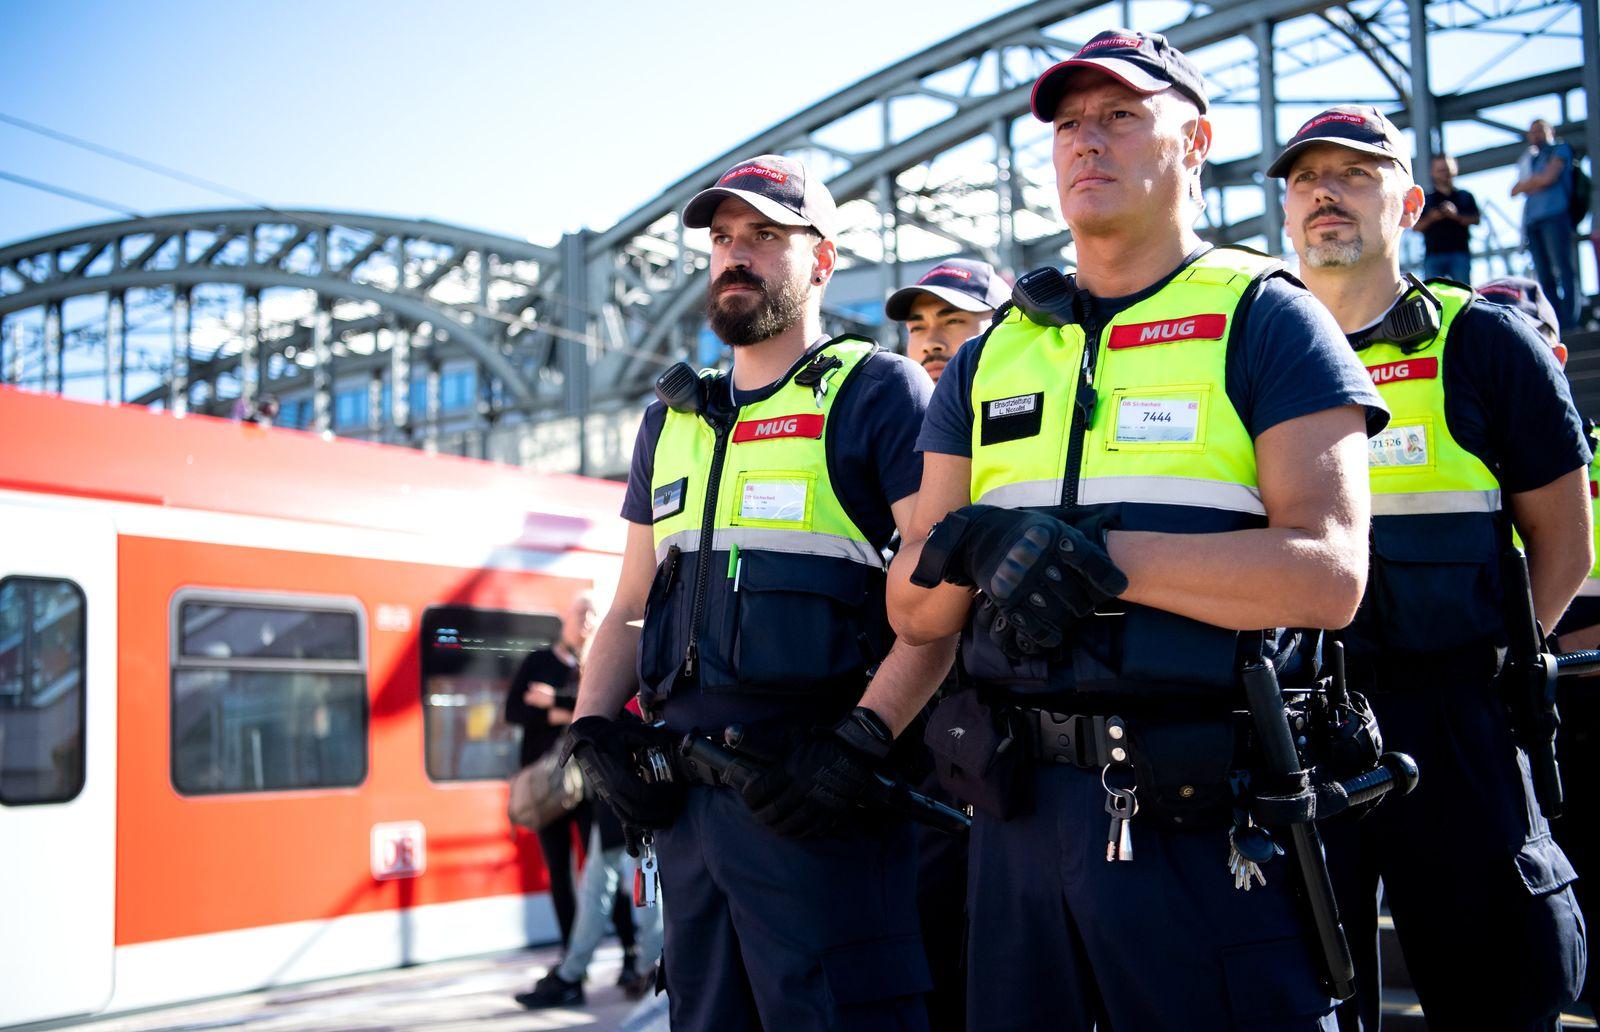 Deutsche Bahn / Personal